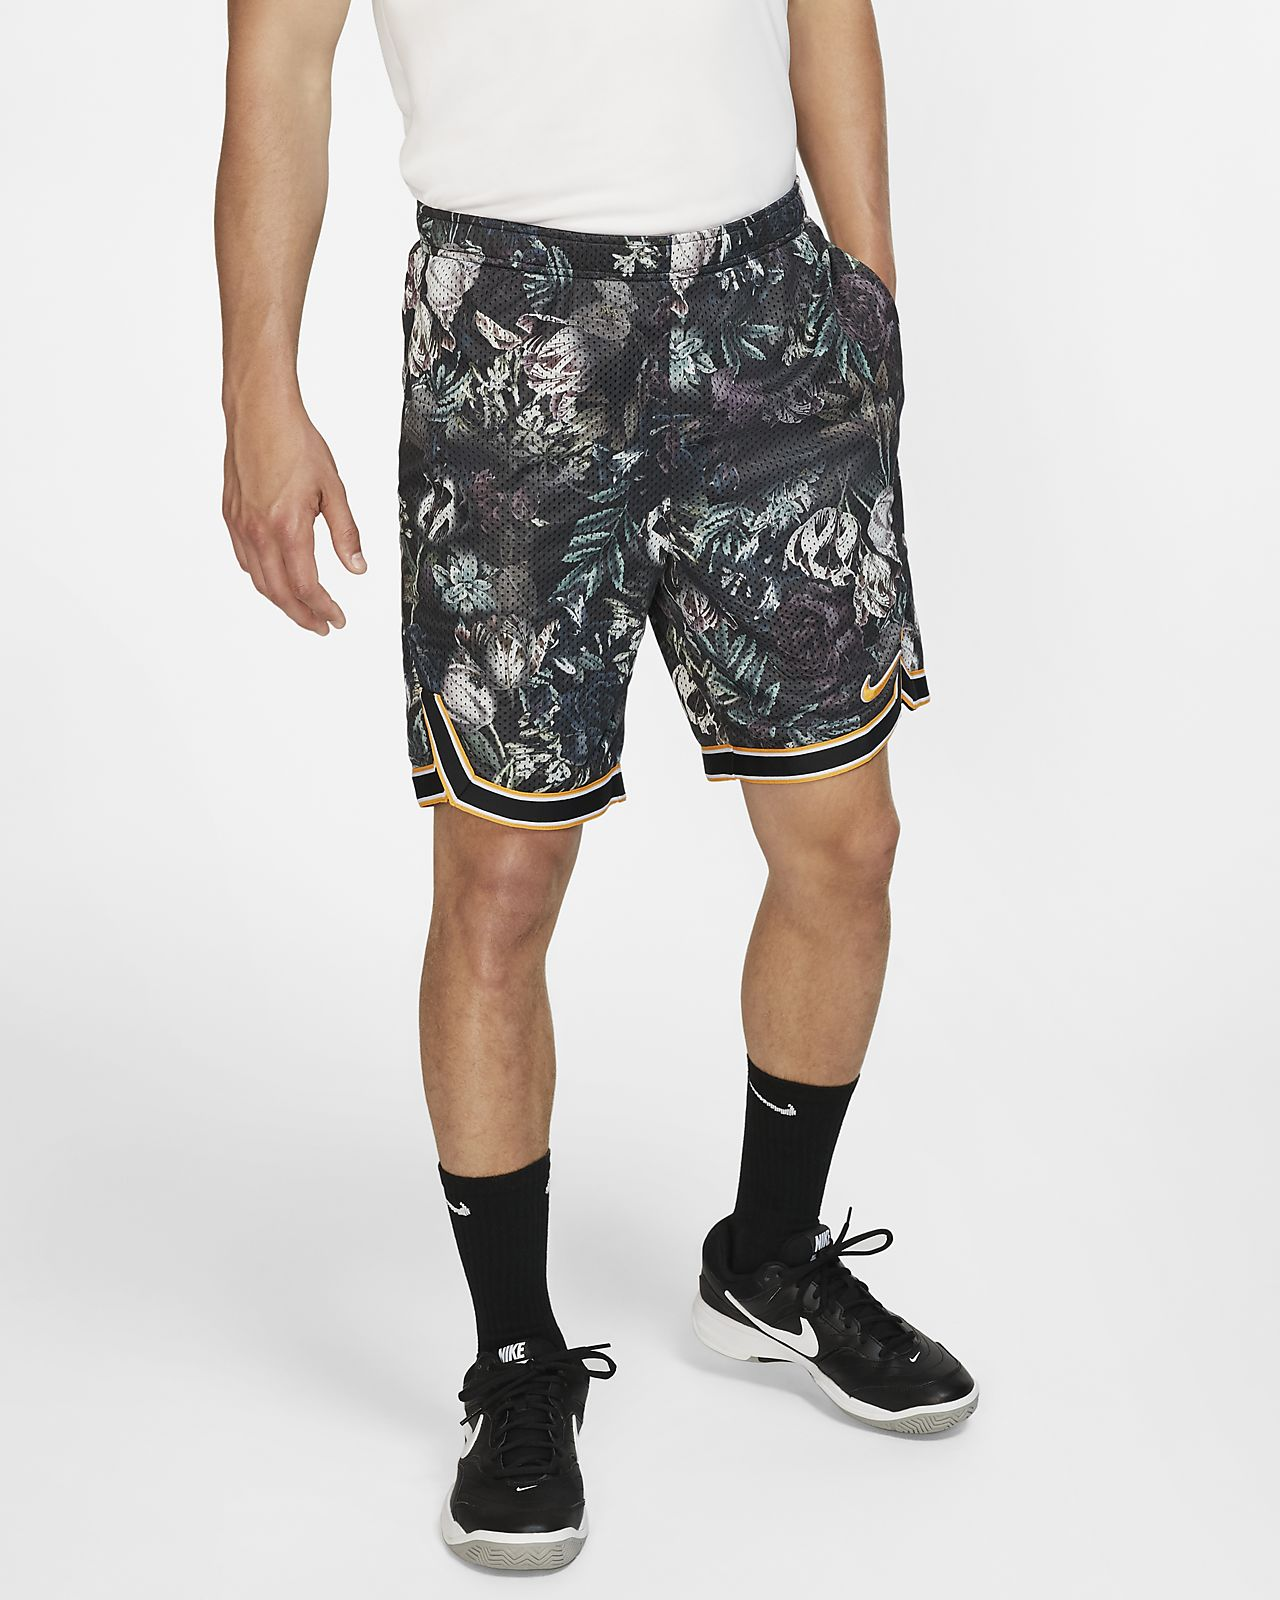 55b8128e122 Nike Court Flex Ace 9 inch Printed Tennis Shorts - SPORTING GOODS ...